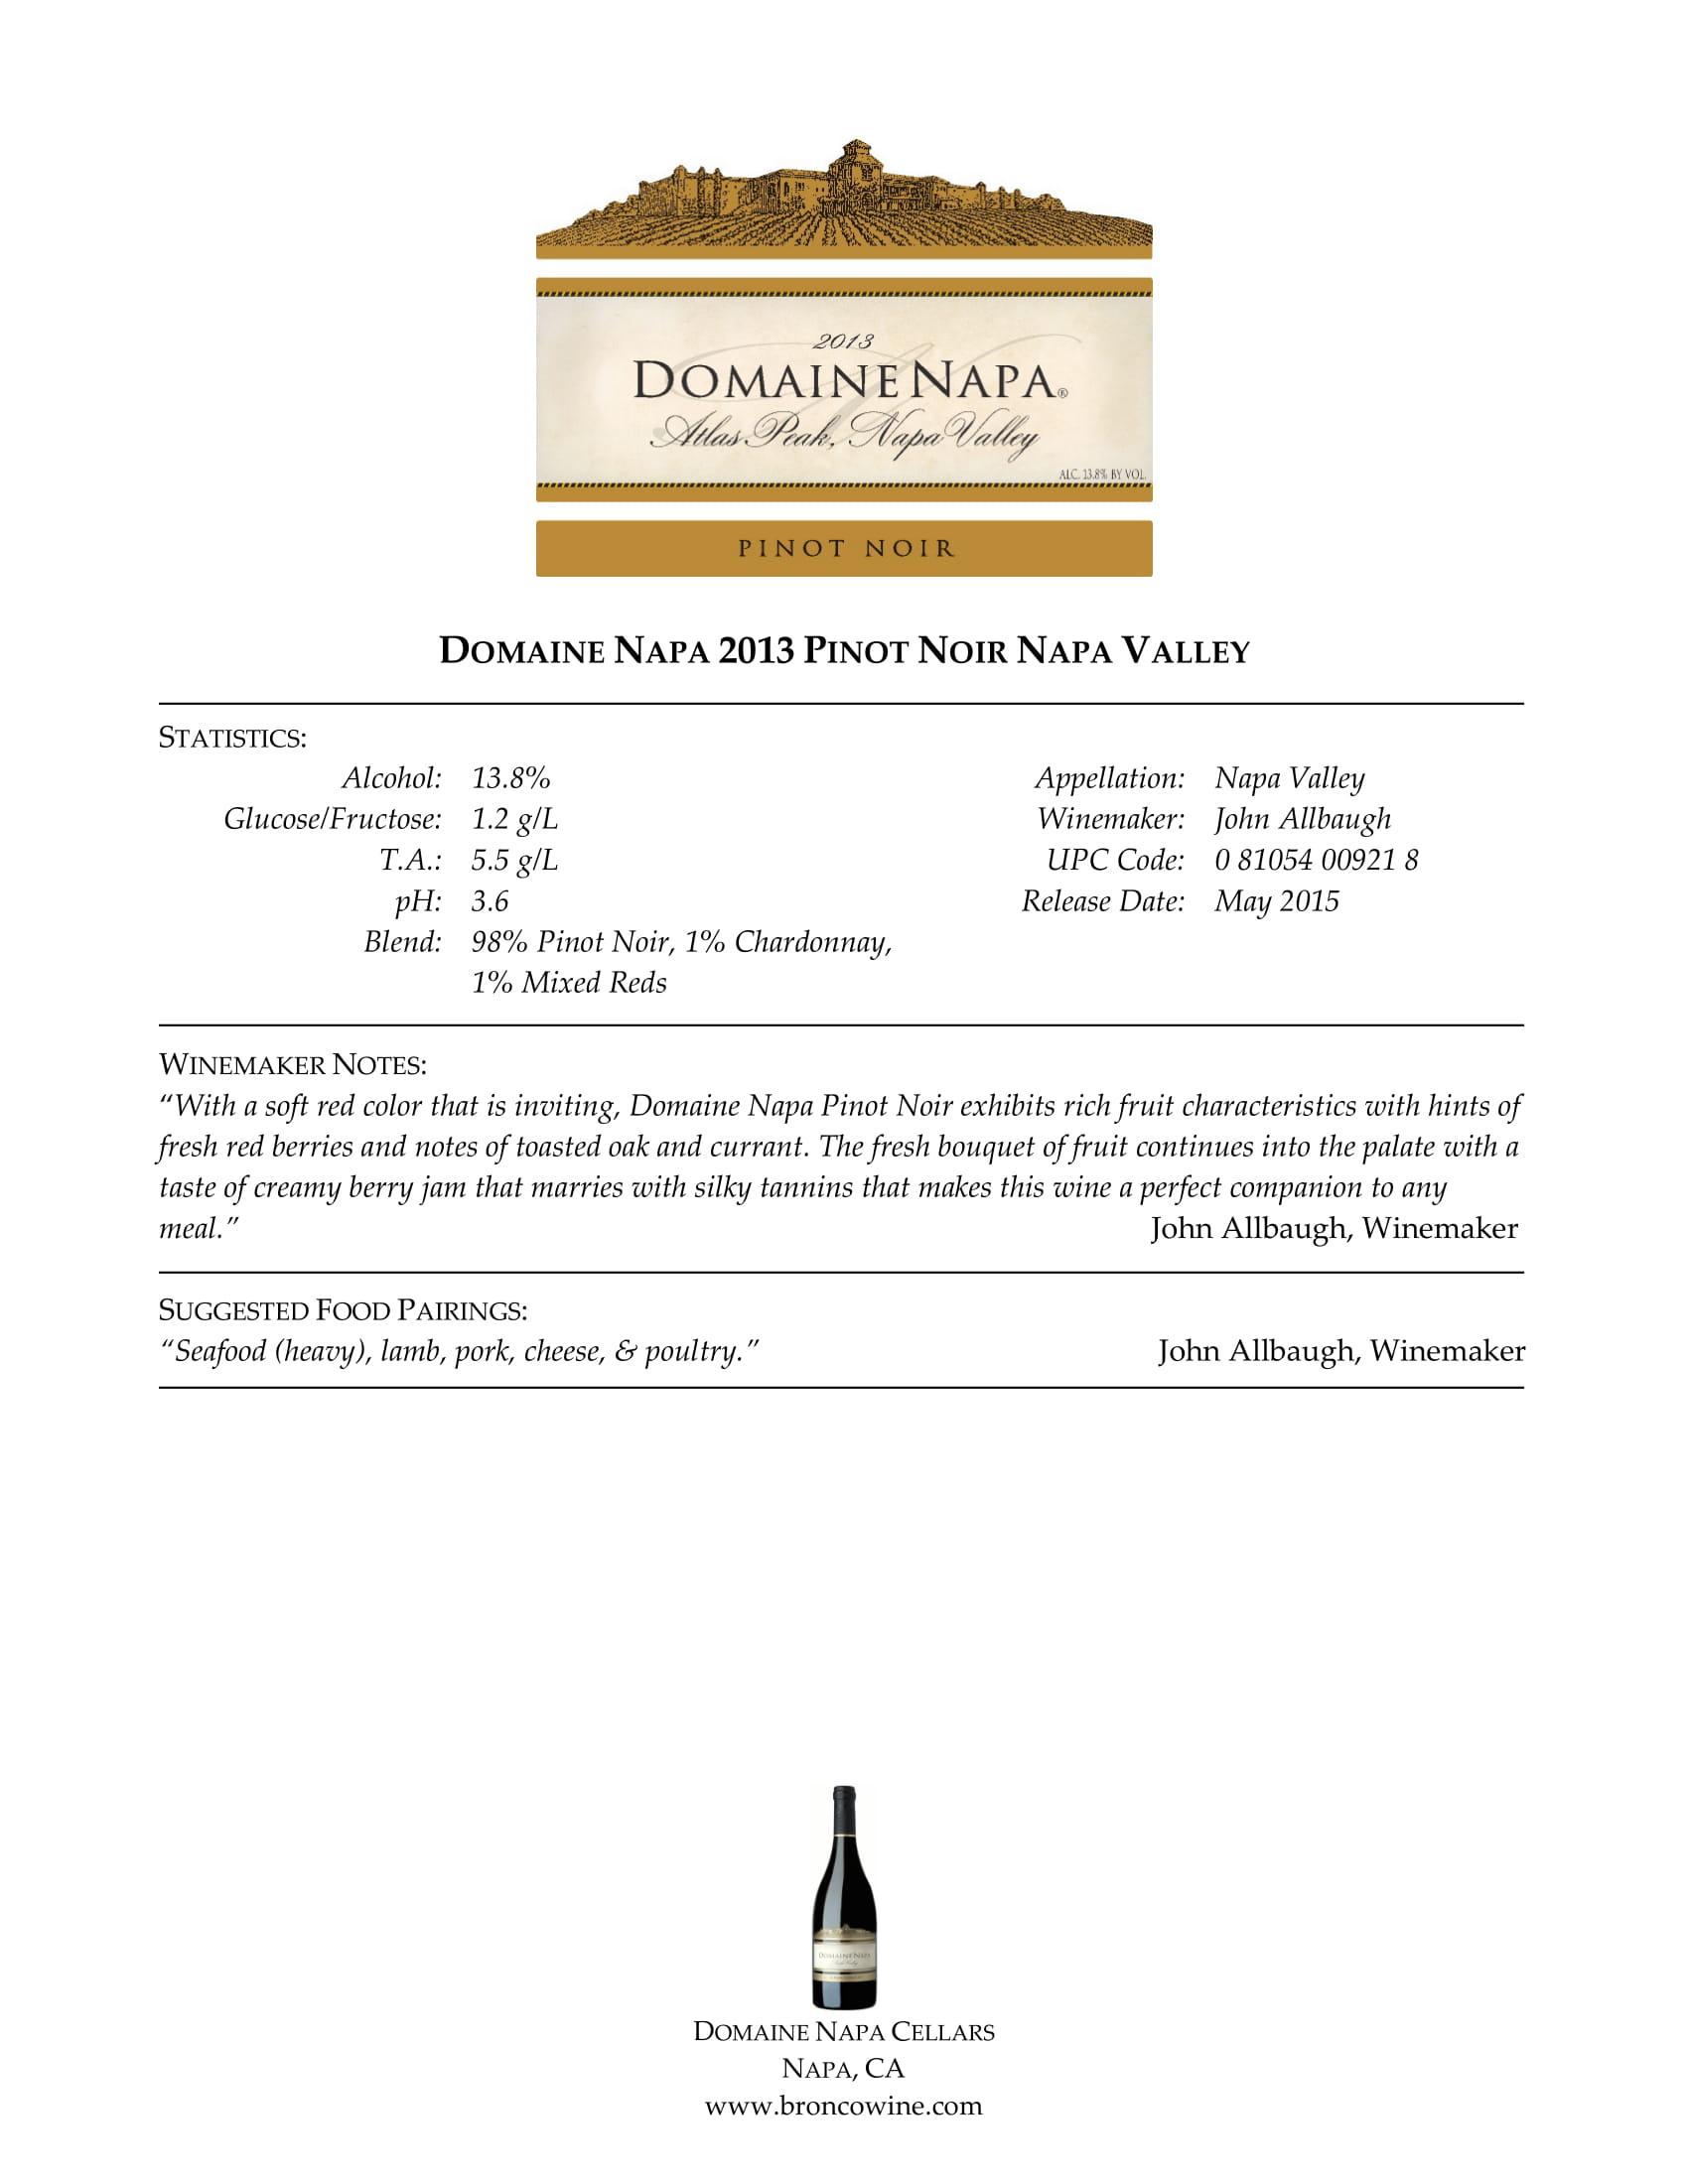 Domaine Napa Pinot Noir Sell Sheet